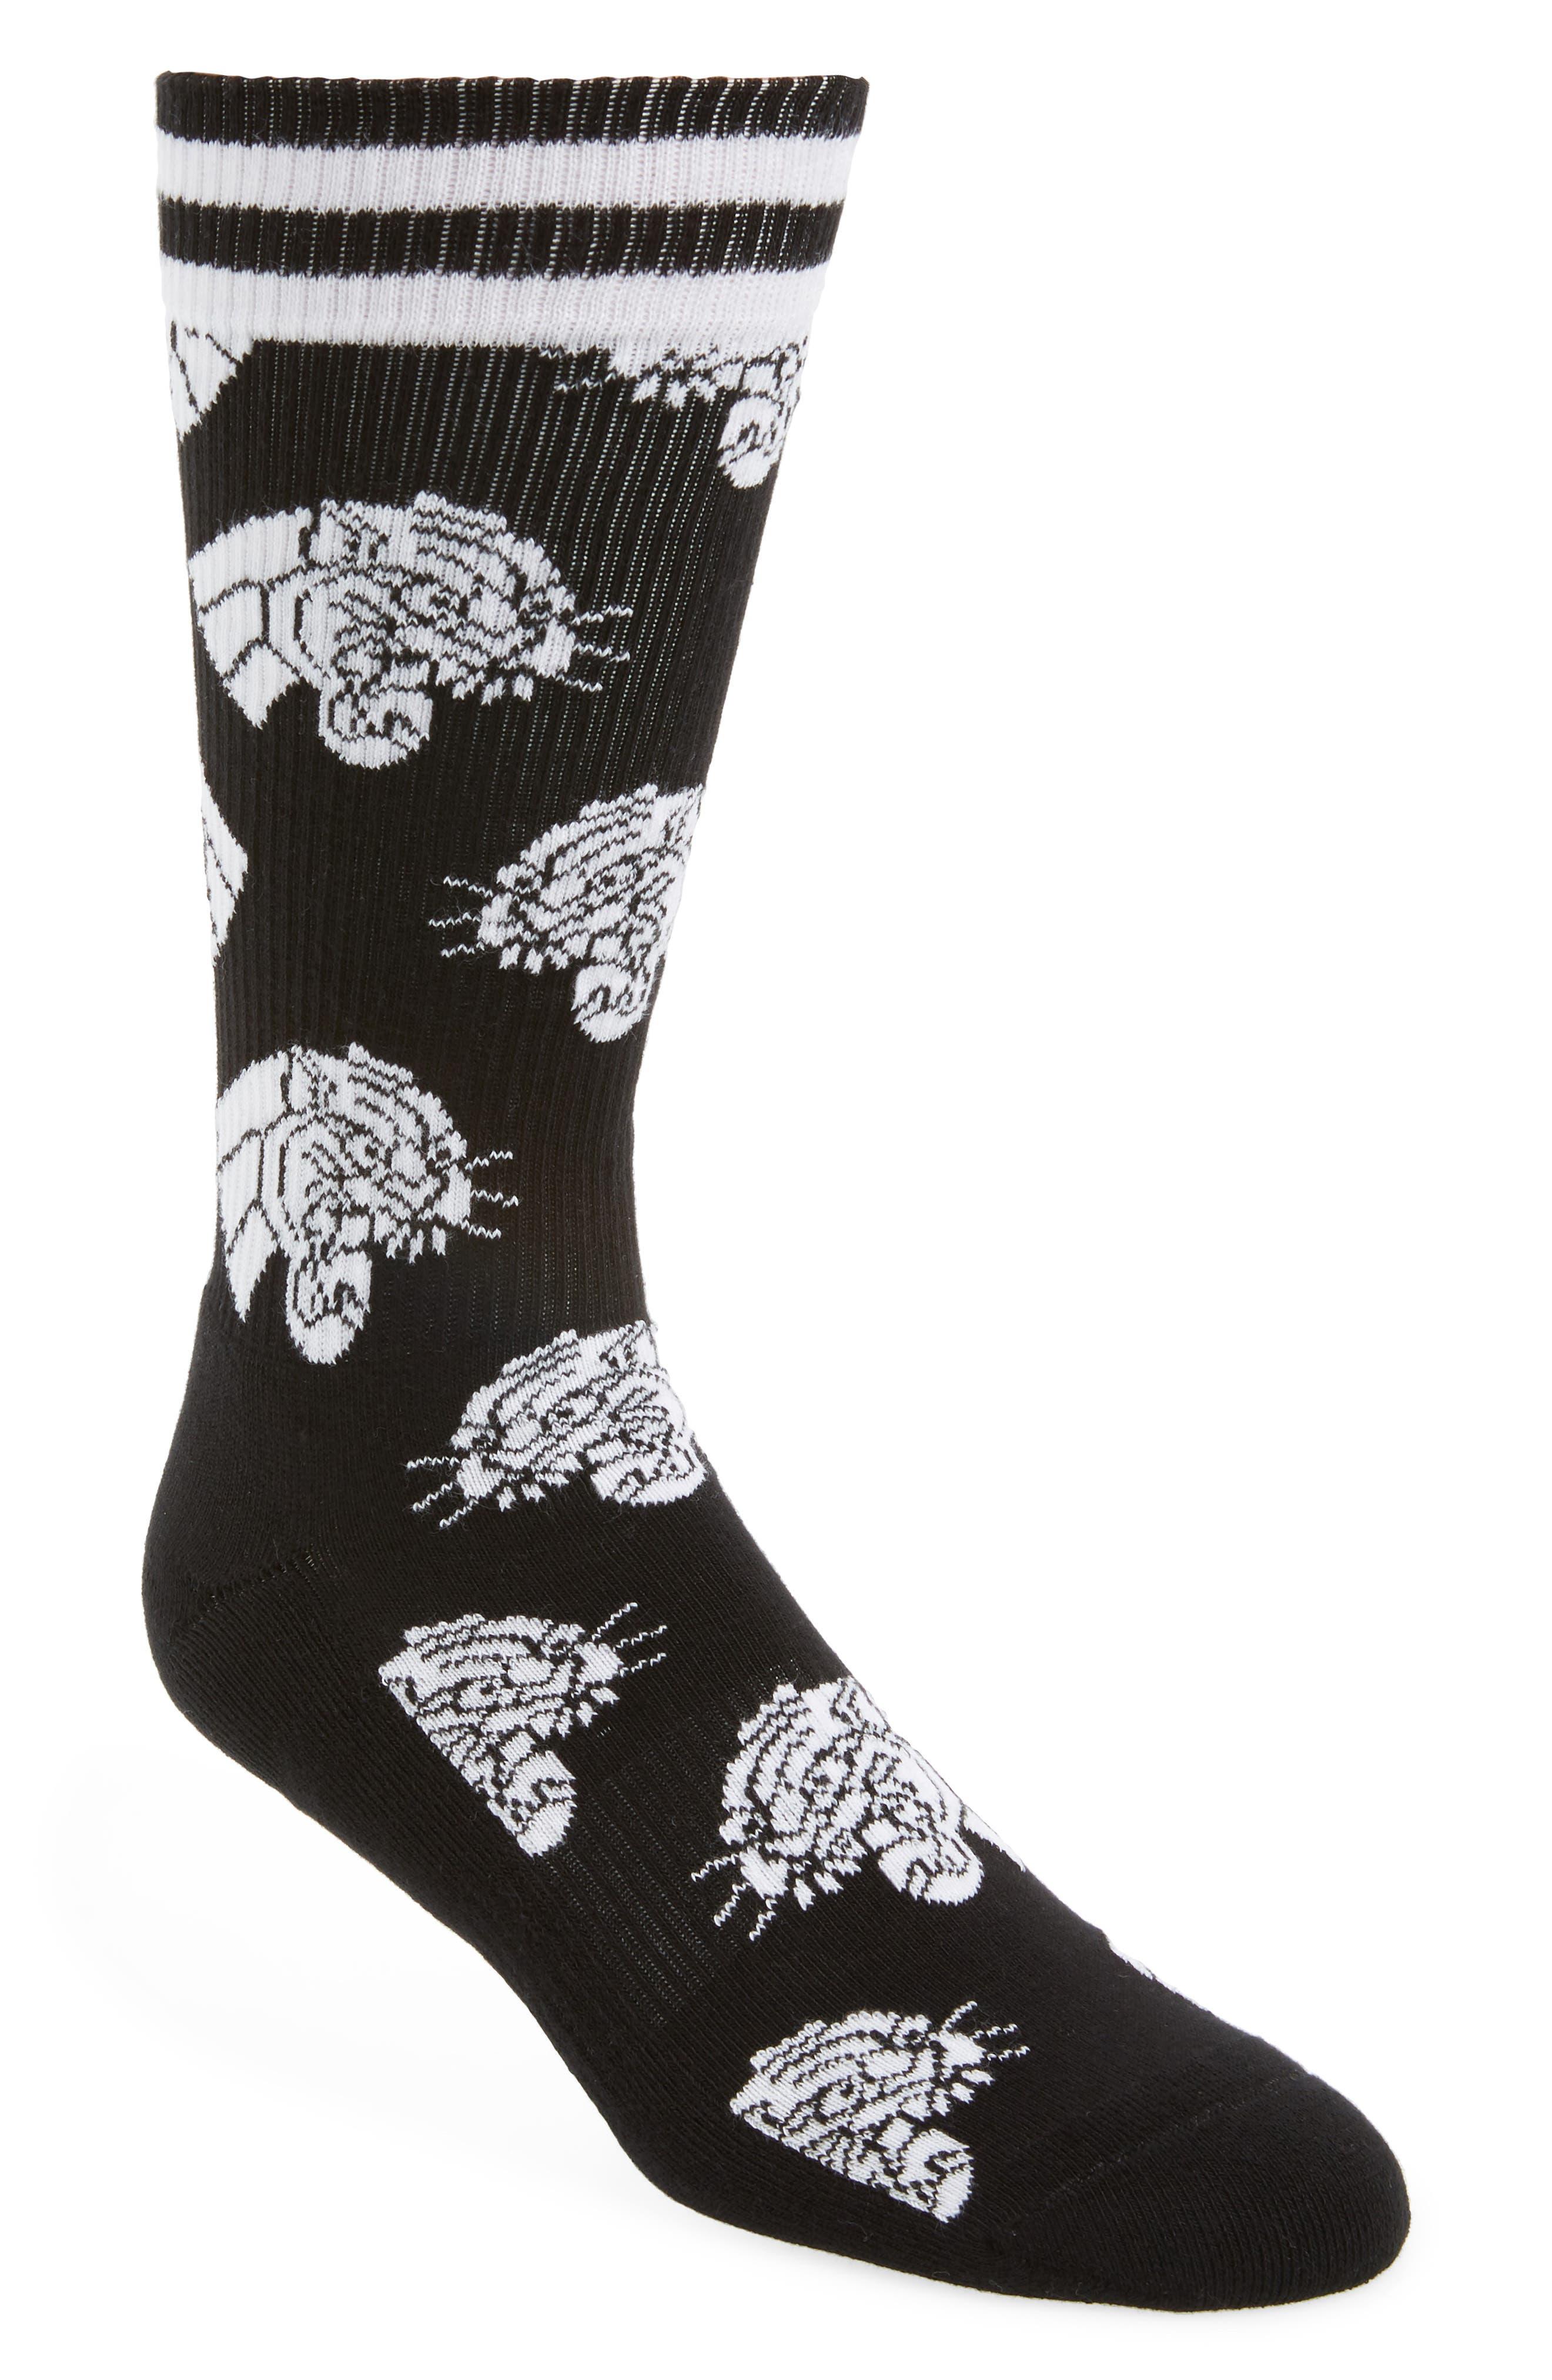 Athletic Mountain Lion Socks,                             Main thumbnail 1, color,                             BLACK